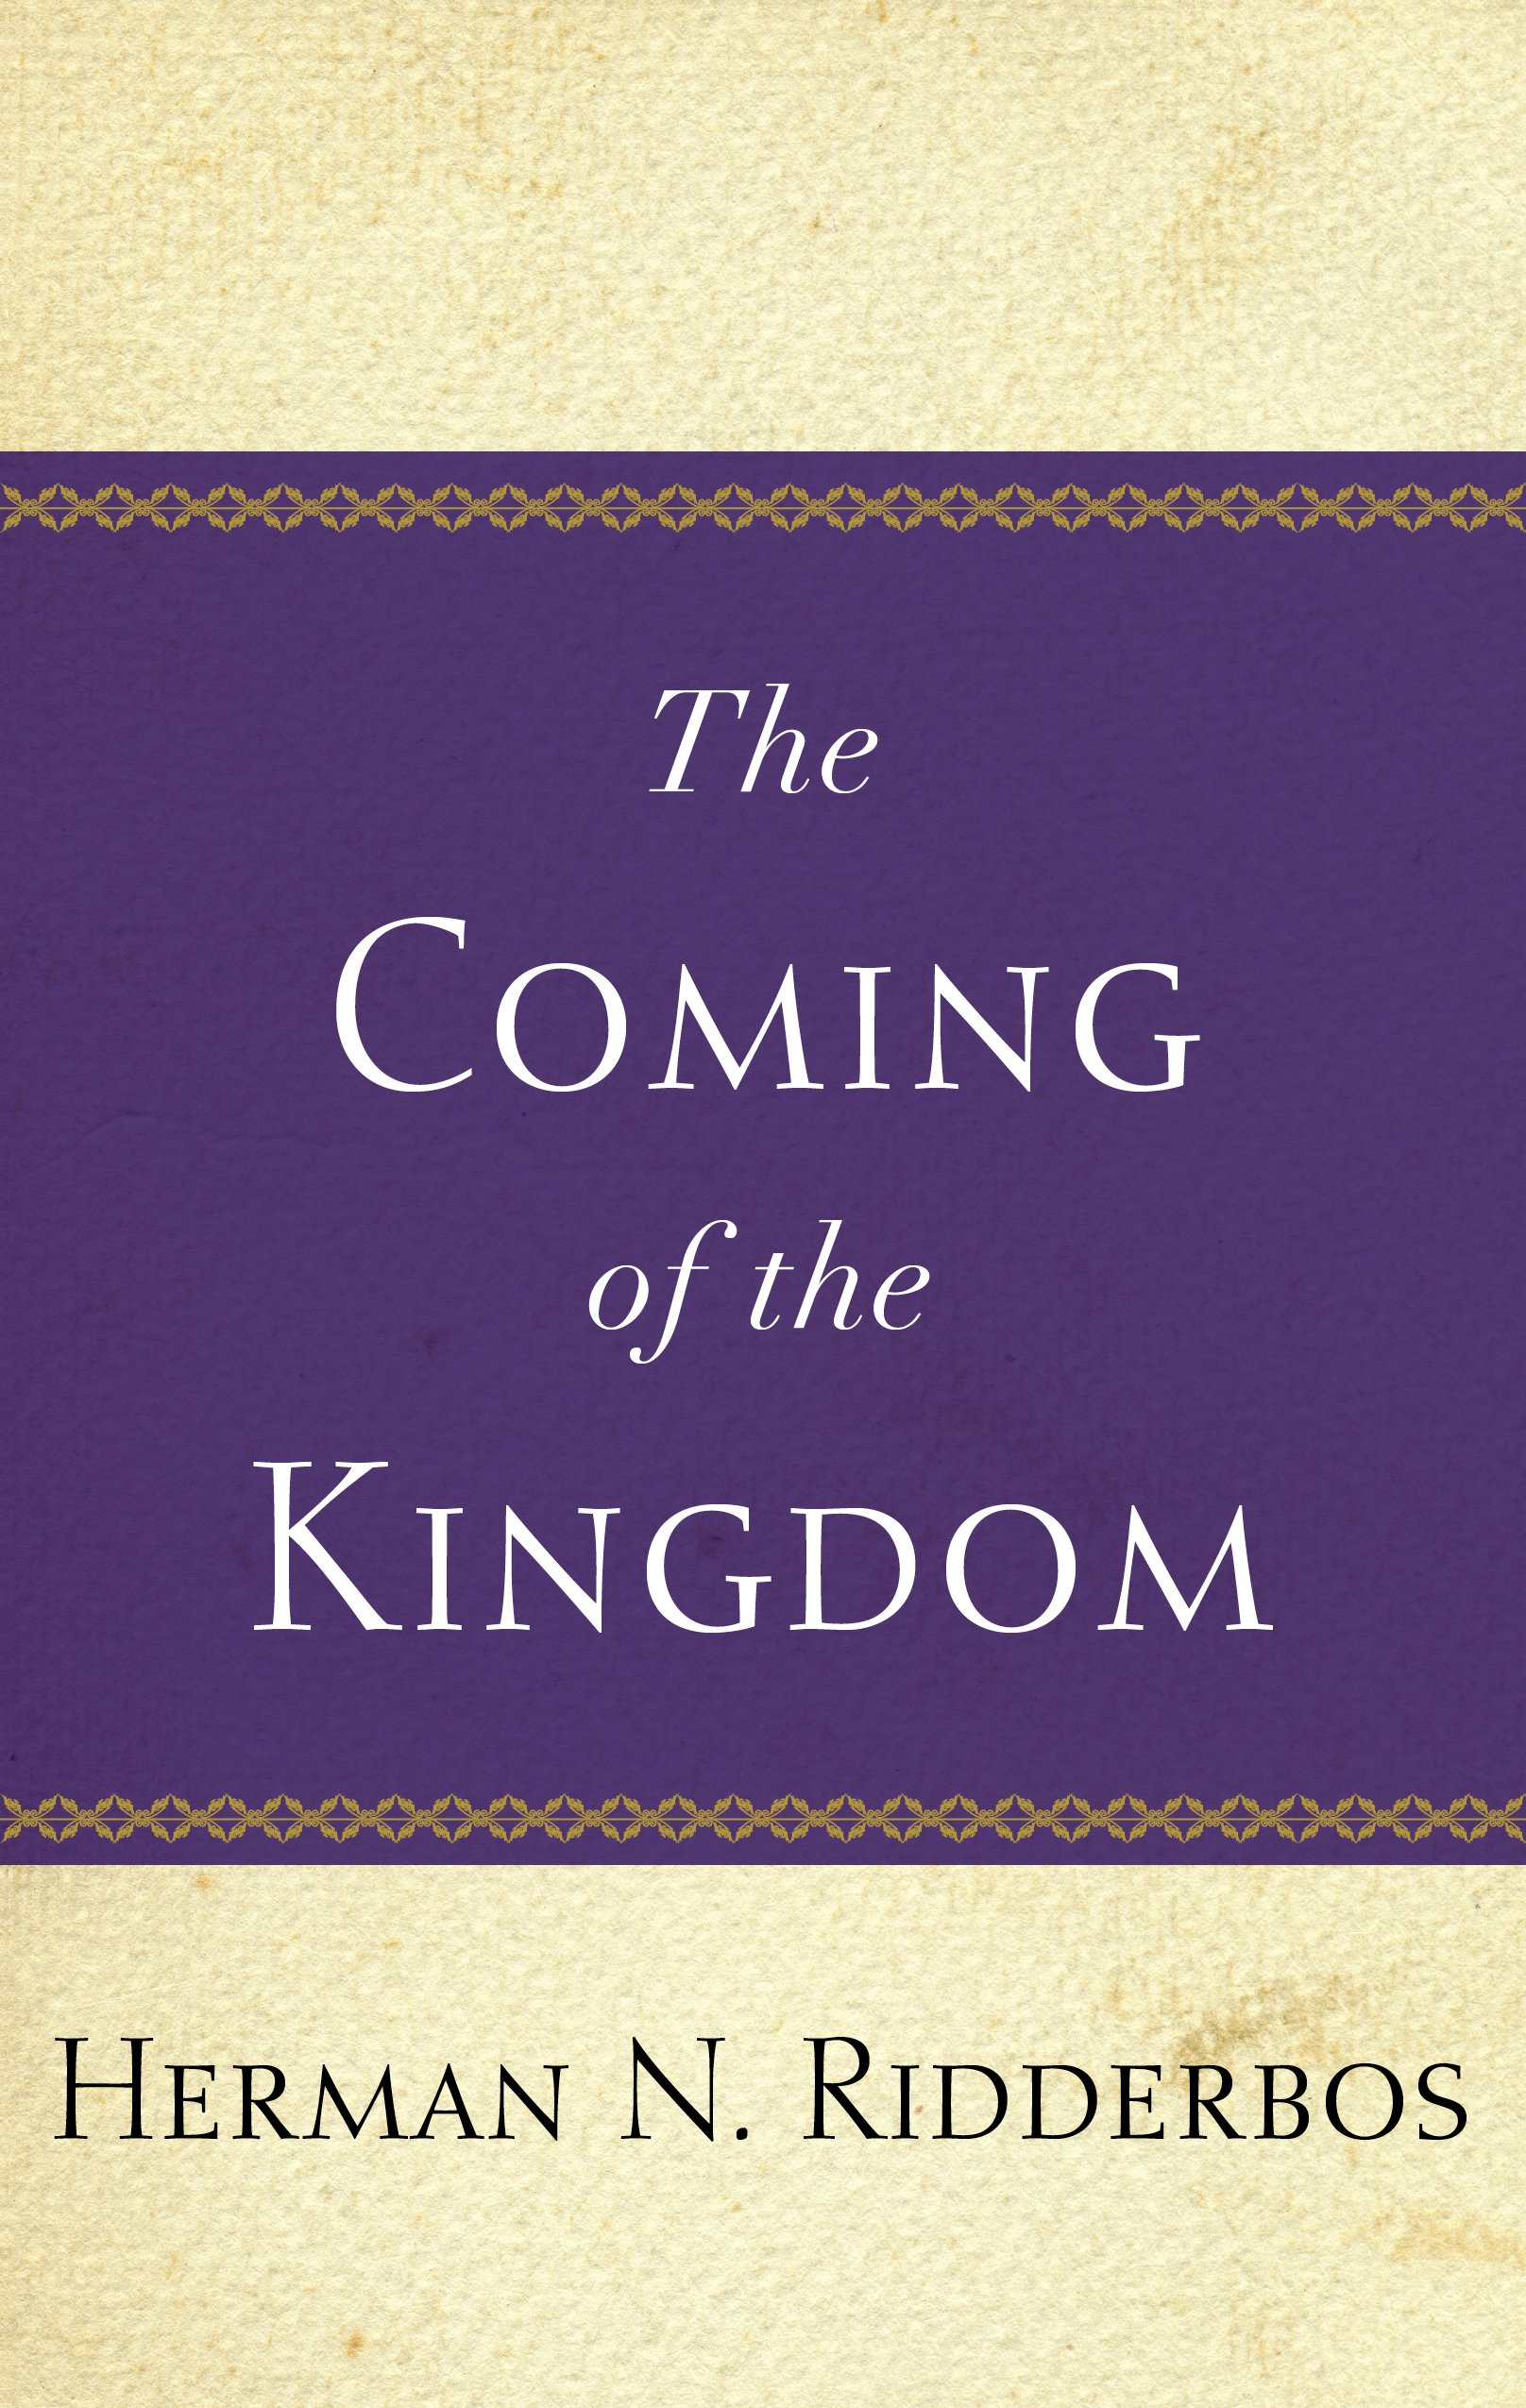 Coming of the kingdom herman n ridderbos raymond o zorn h de coming of the kingdom herman n ridderbos raymond o zorn h de jongste 9780875524085 amazon books fandeluxe Choice Image